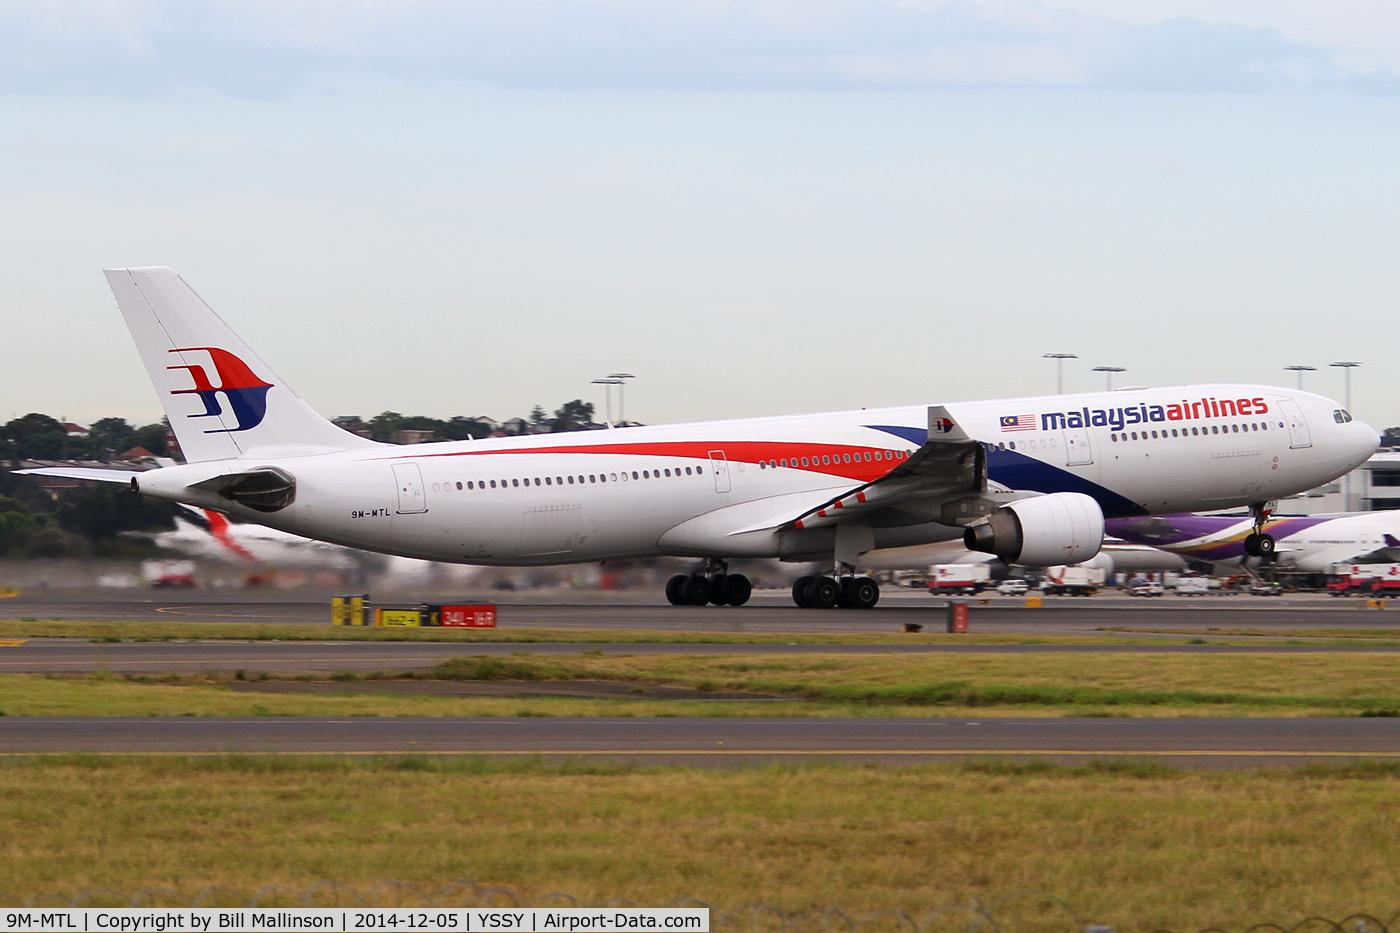 9M-MTL, 2013 Airbus A330-323X C/N 1395, rotating